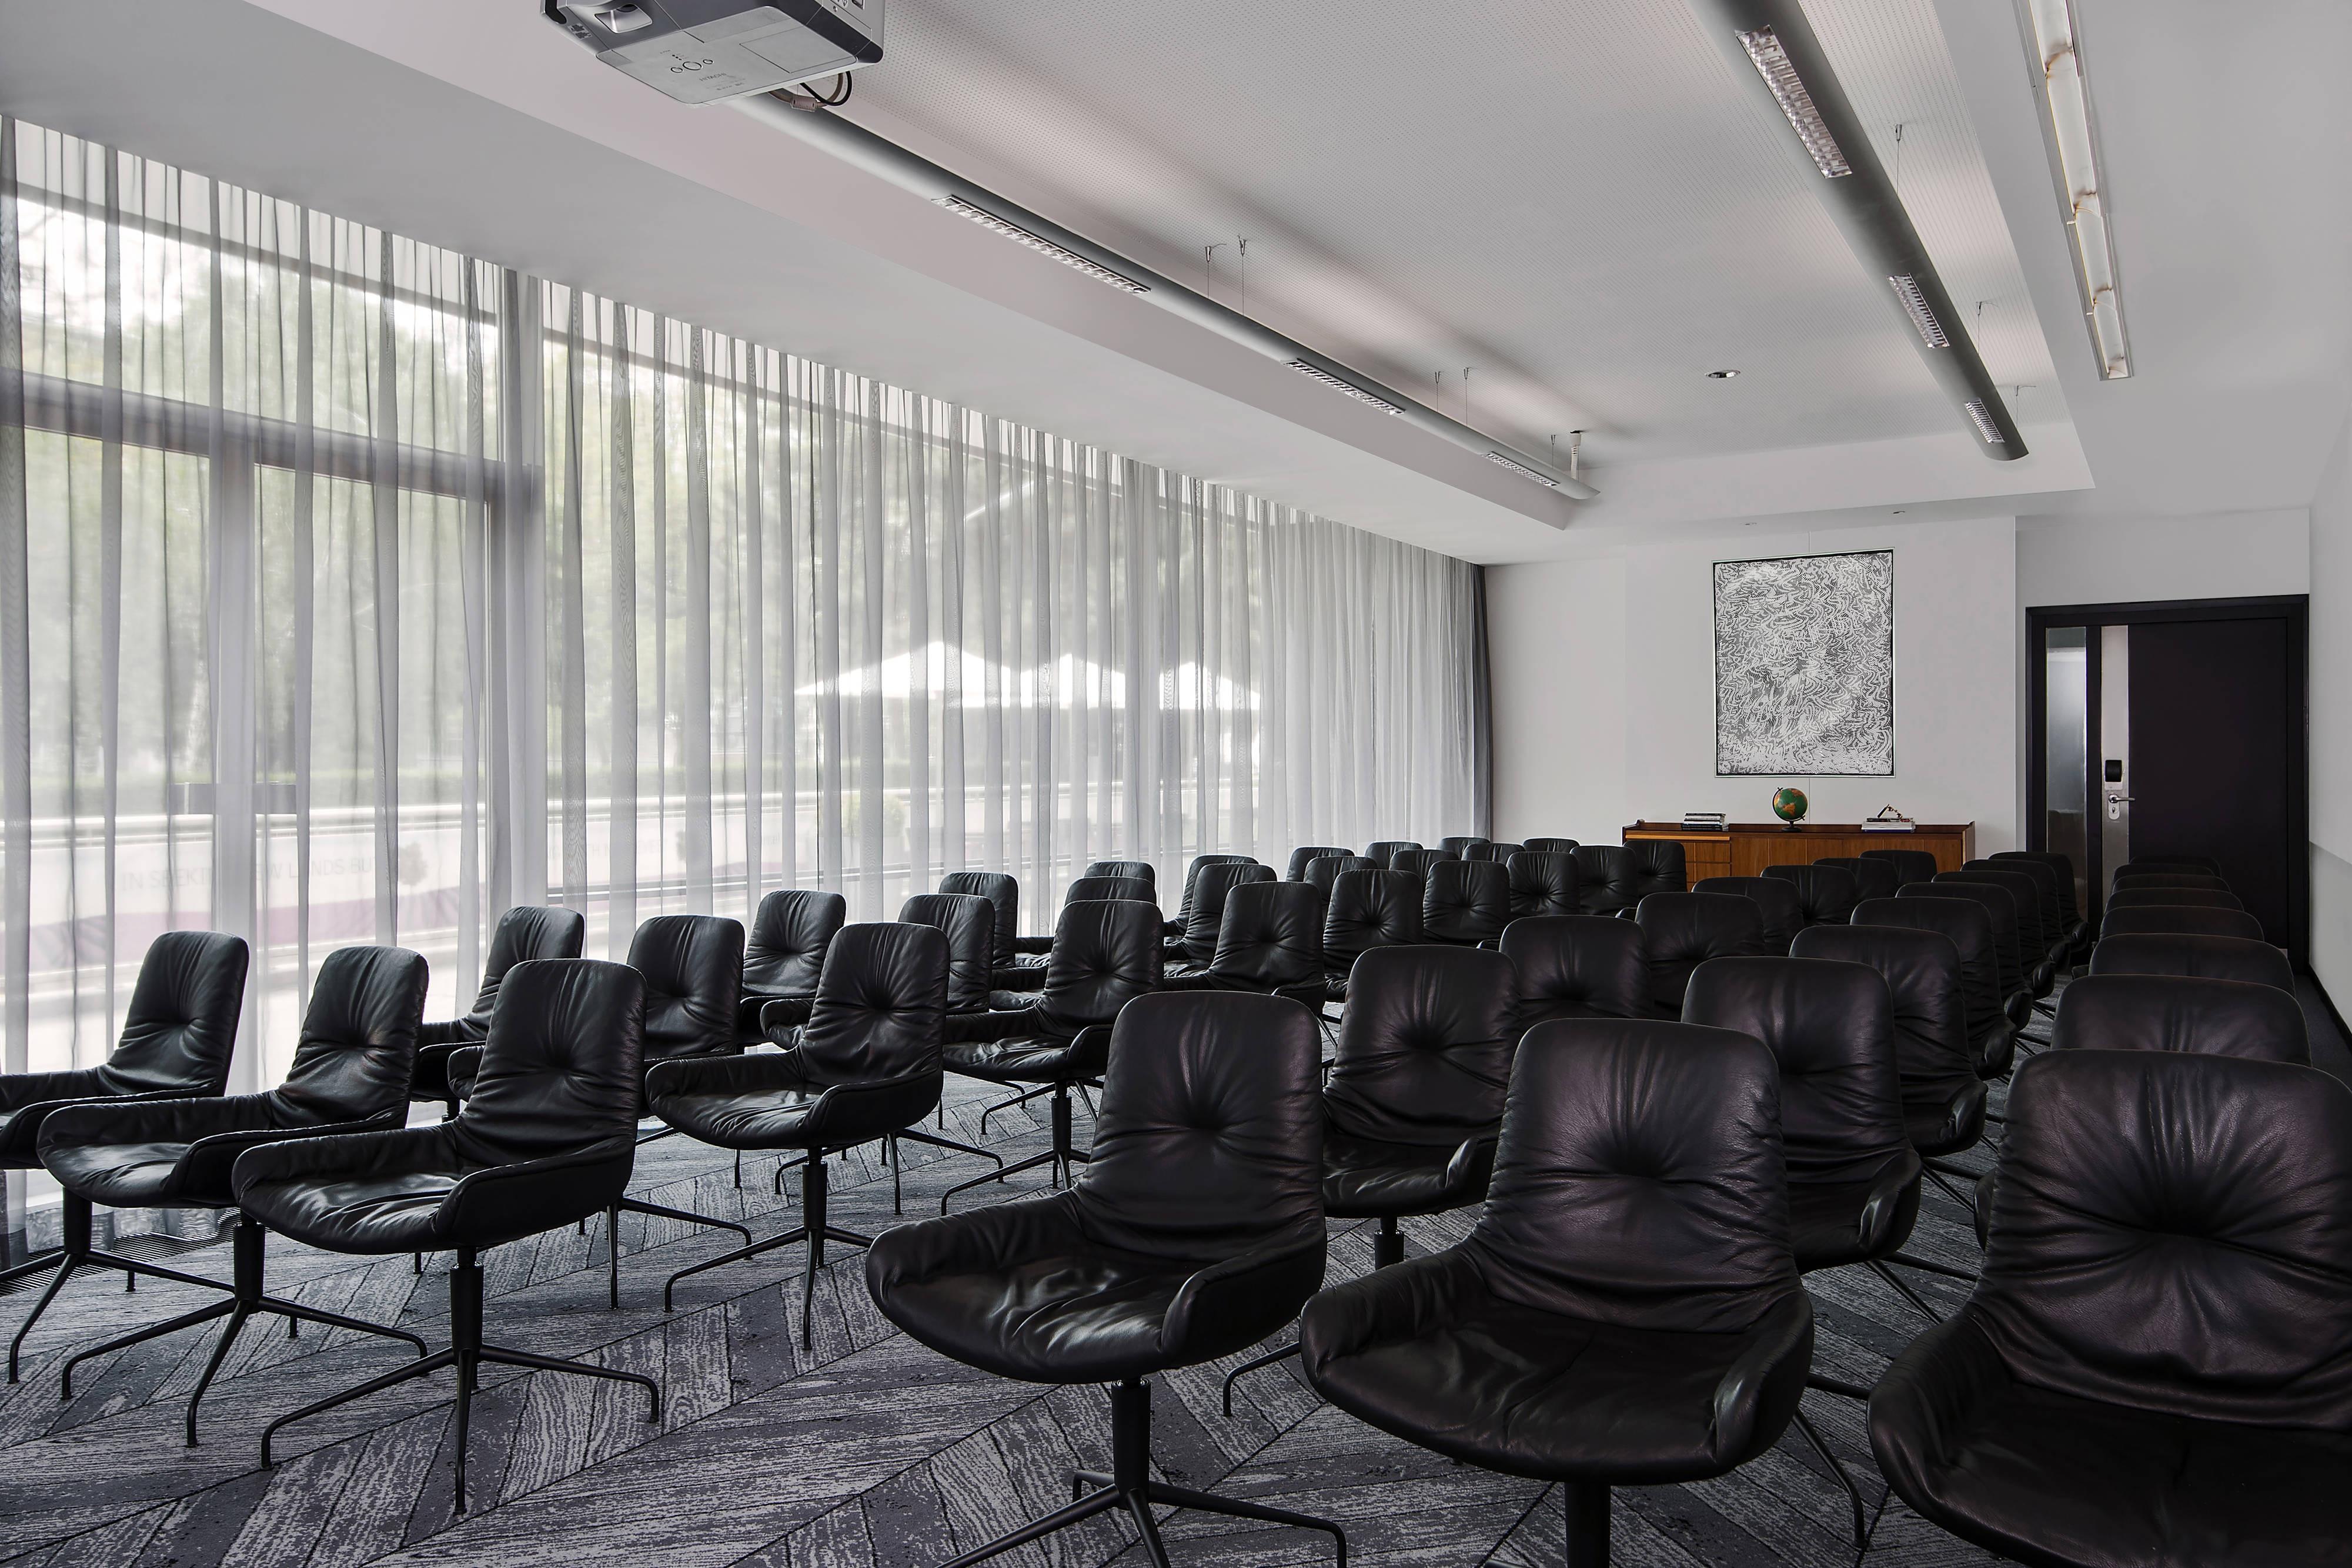 Blazing White Theatre-Style Meeting Meeting